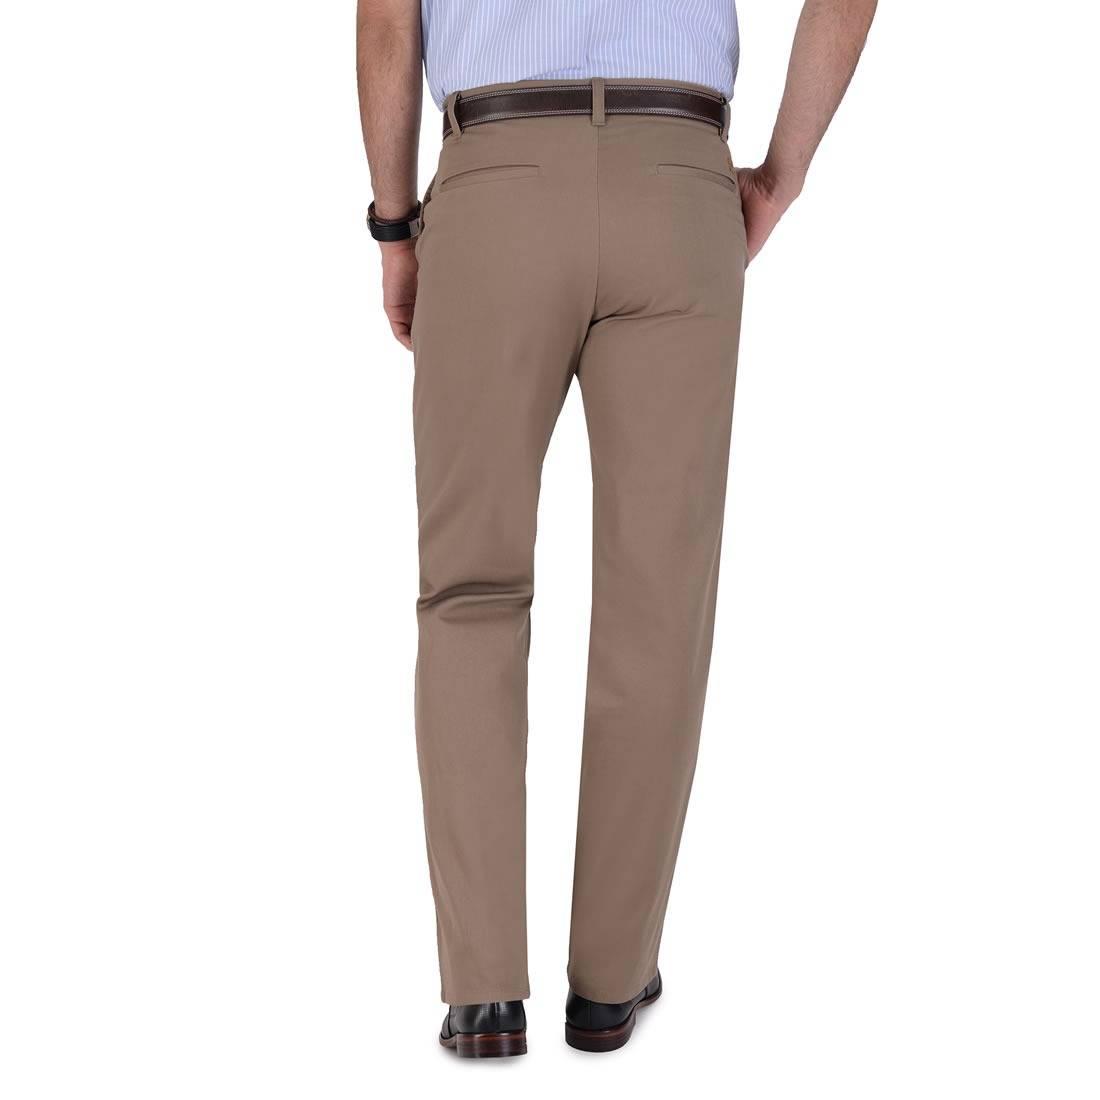 010789055268-02-Pantalon-Casual-Classic-Fit-Cafe-yale